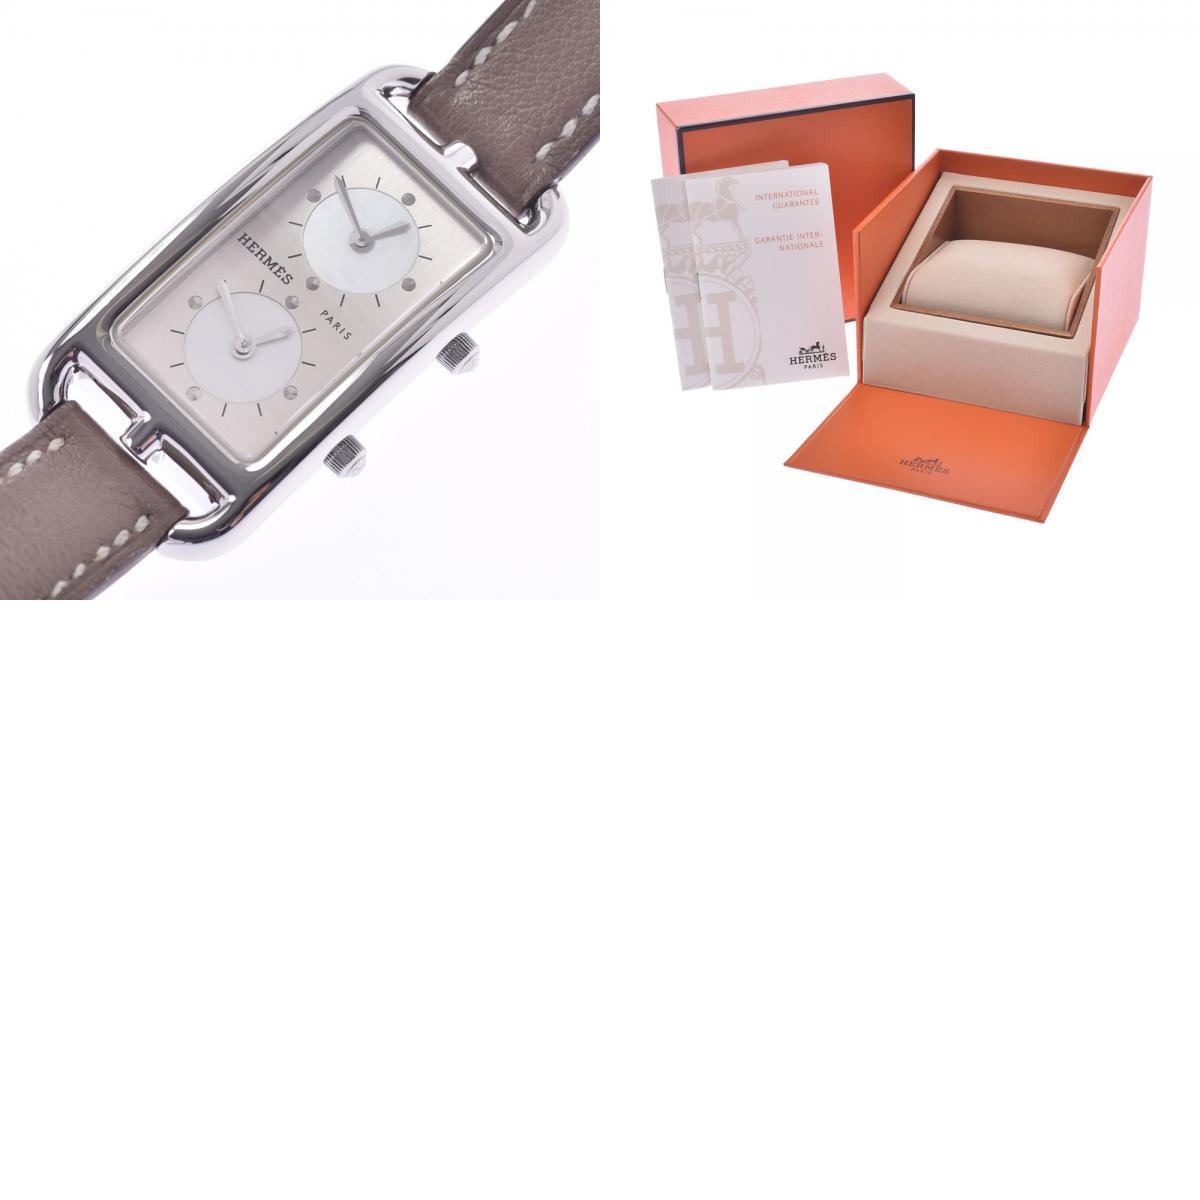 HERMES エルメス ケープコッド ドゥゾーン CC3 210 レディース SS 革 腕時計 クオーツ シルバー文字盤 Aランク銀蔵tdohBQrCxs